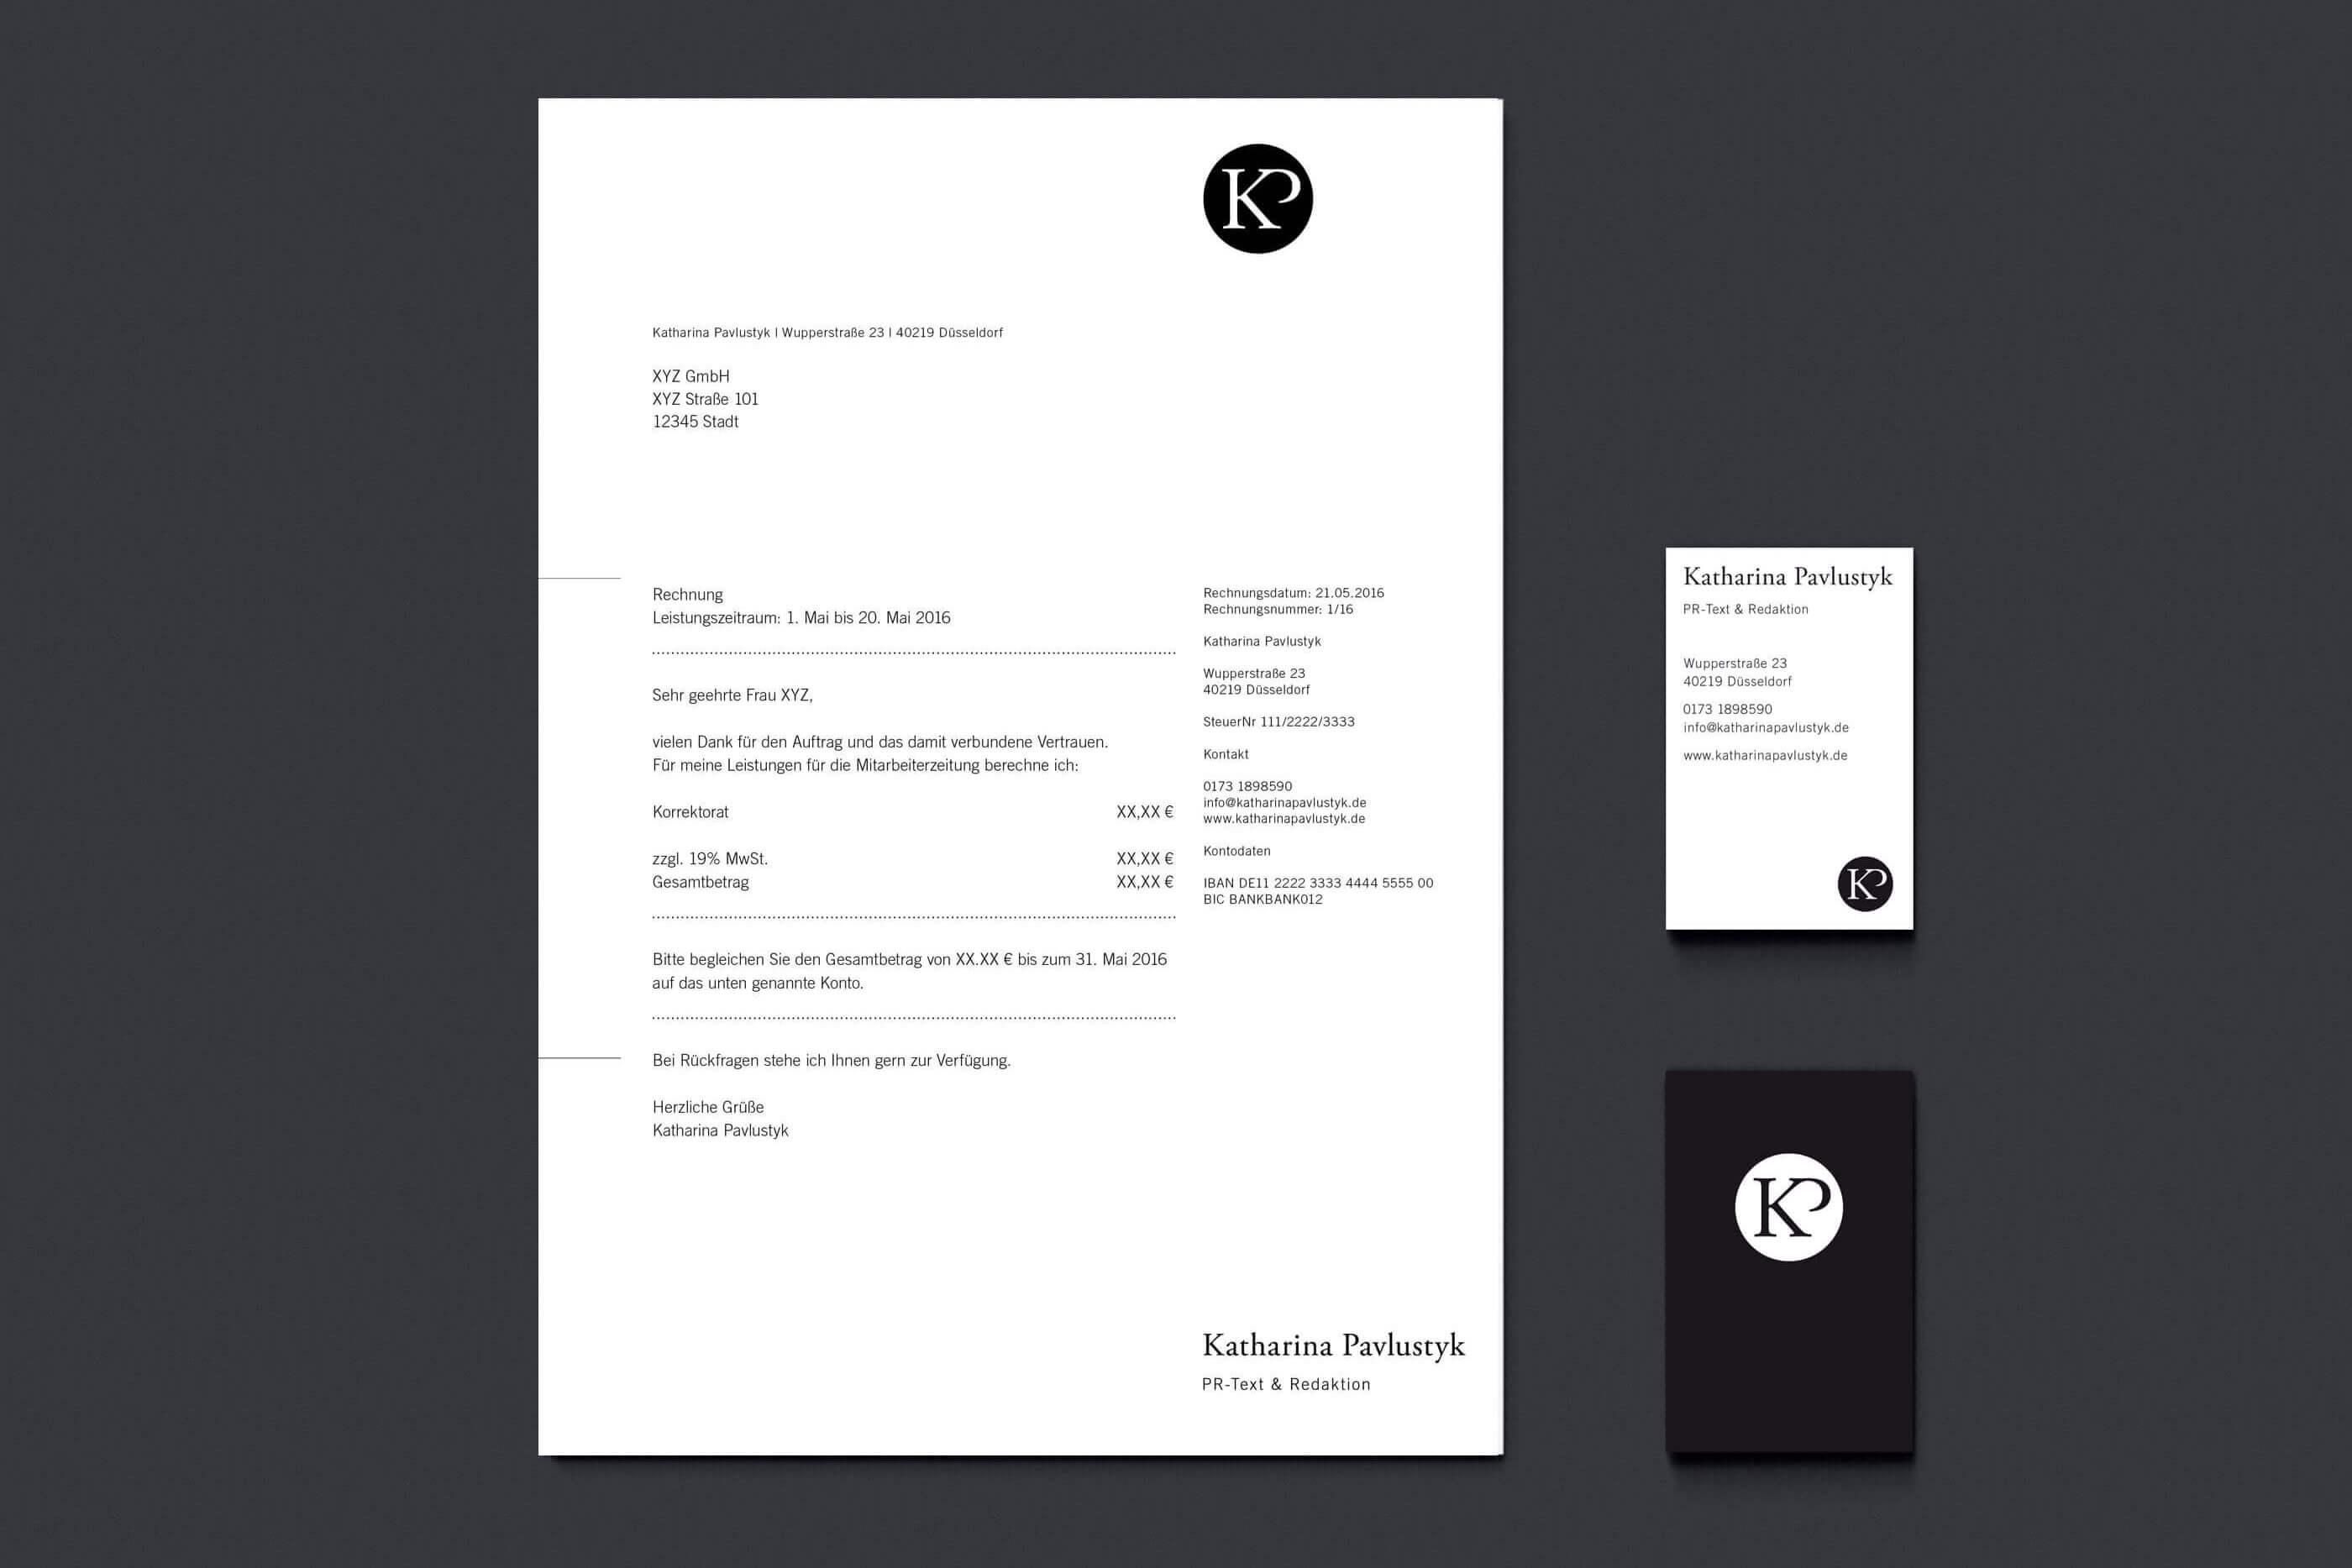 YVONNE RUNDIO Katharina Pavlustyk Corporate Design